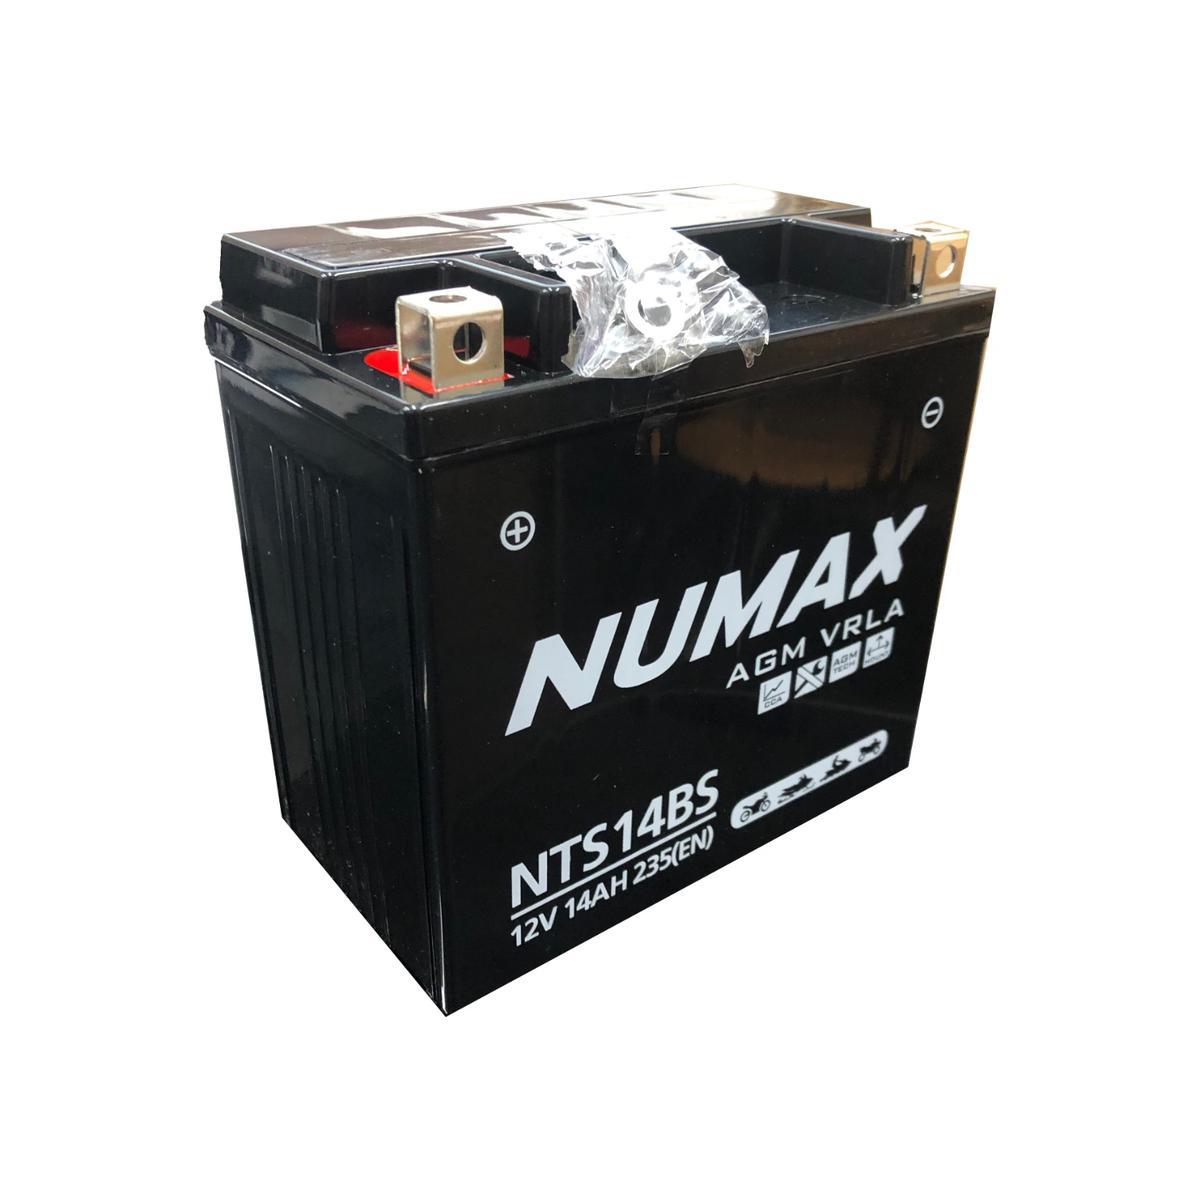 Numax NTS14BS Honda XRV750 Africa Twin Motorbike Battery NEW